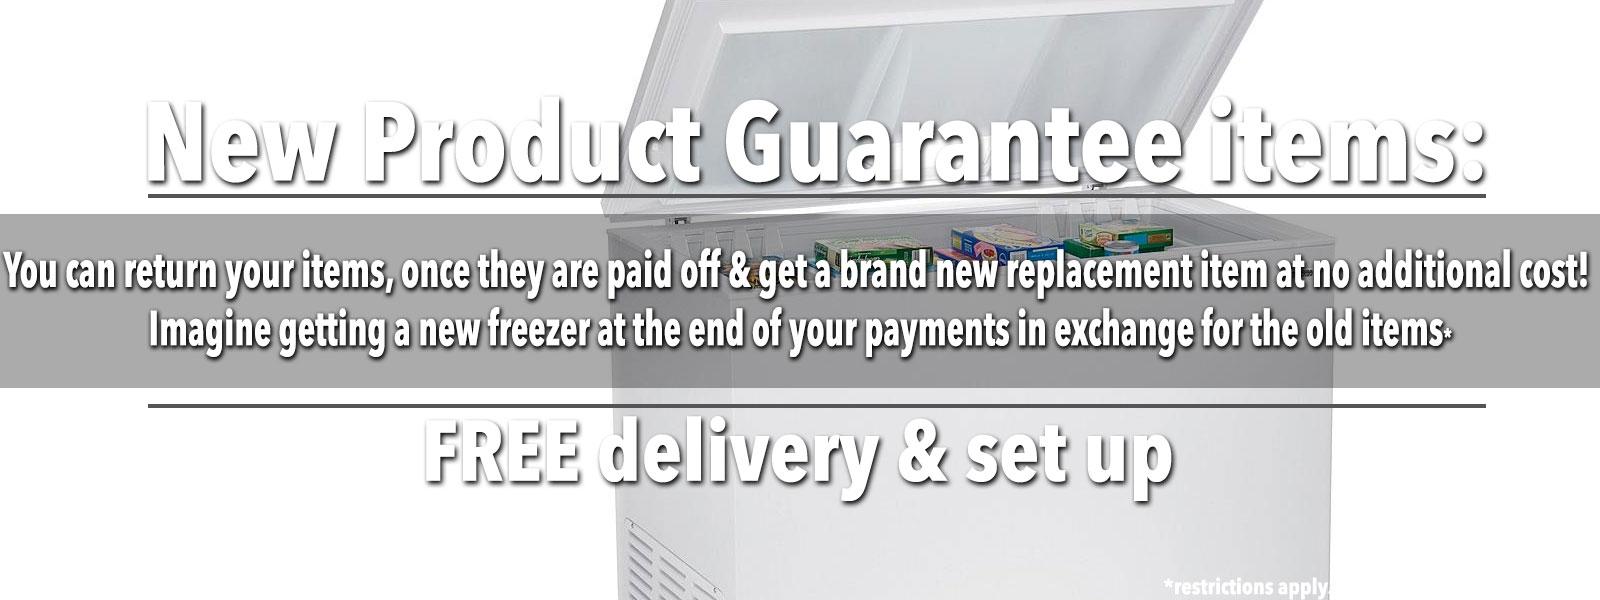 freezer-info-banner